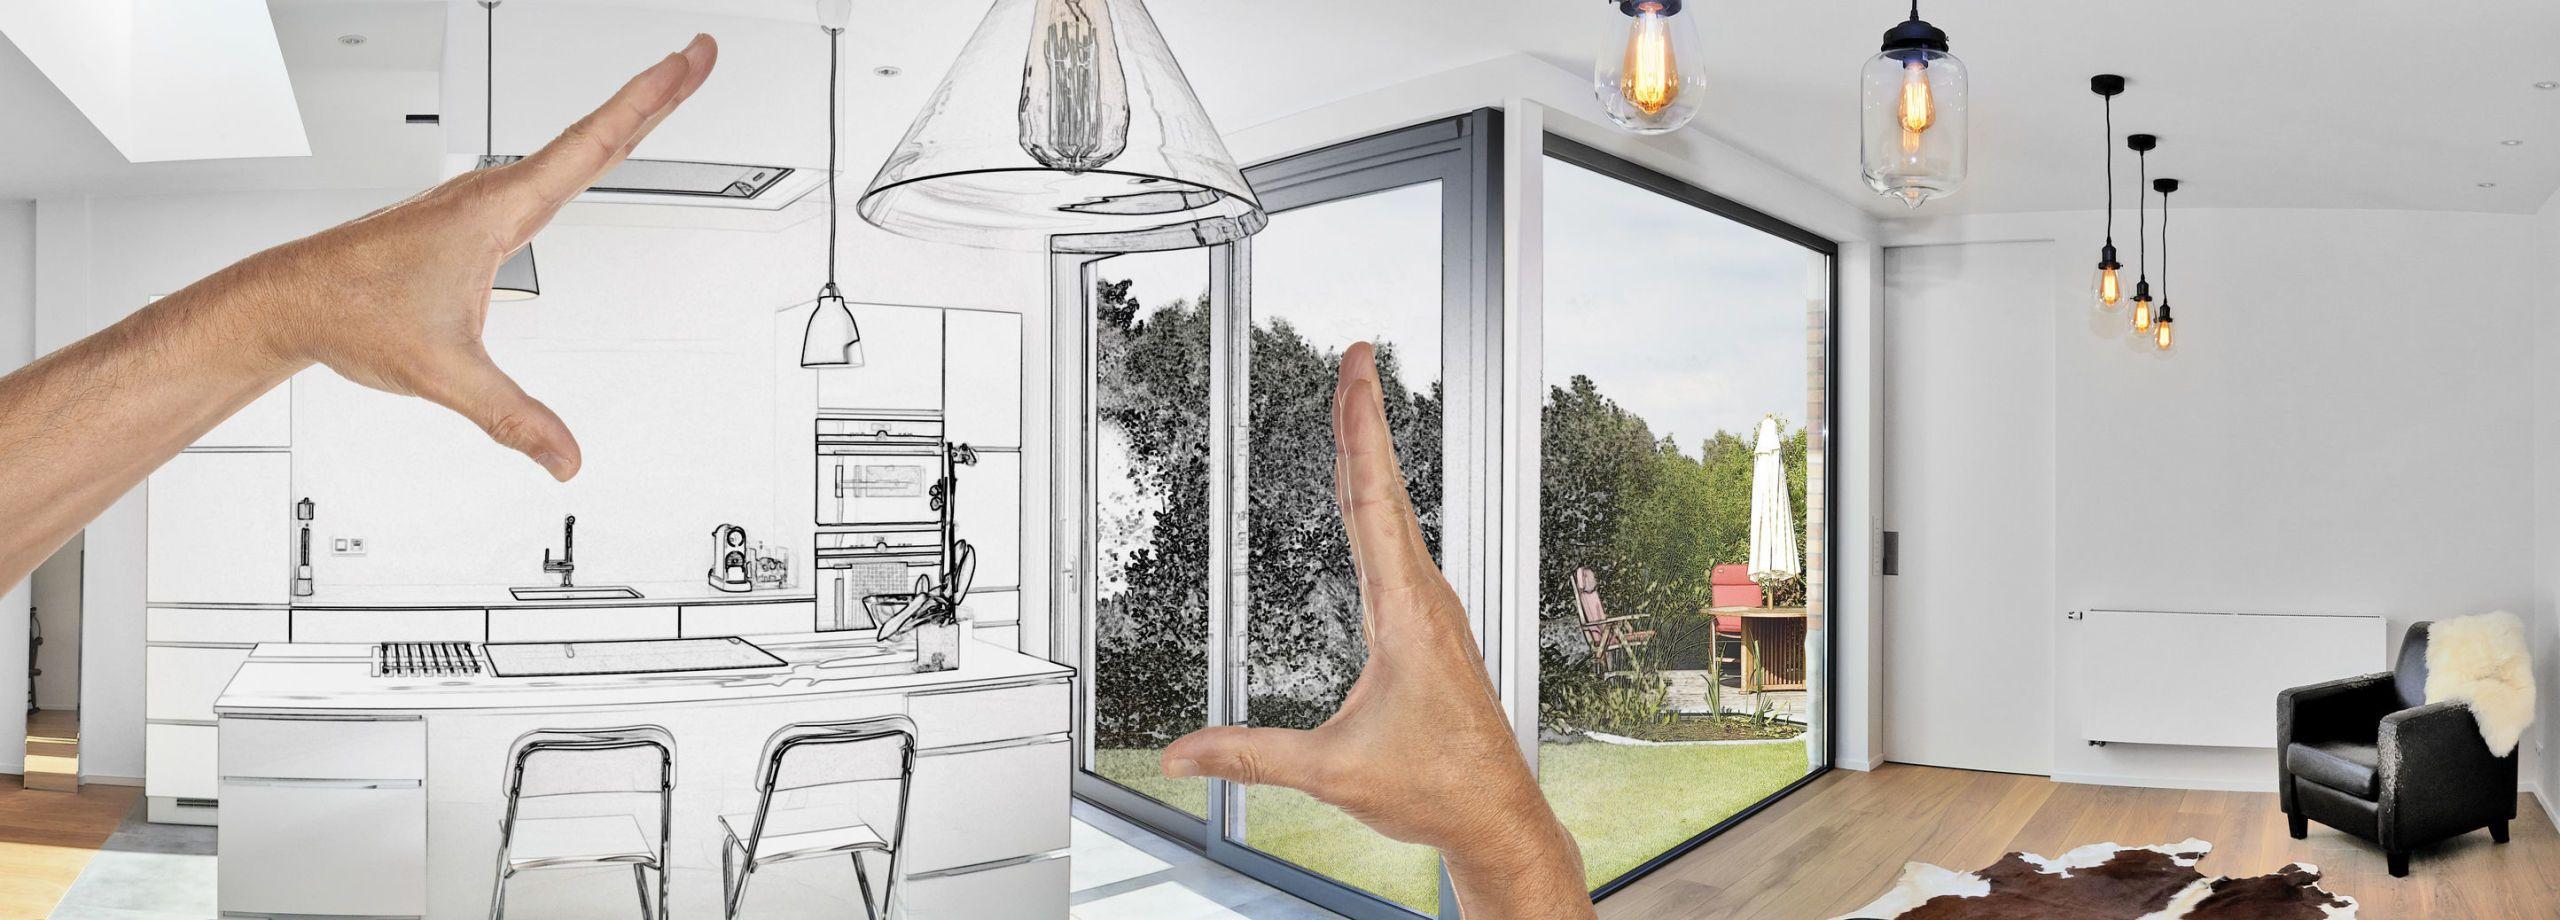 Delightful Planned Renovation Of A Open Modern Kitchen From Loft